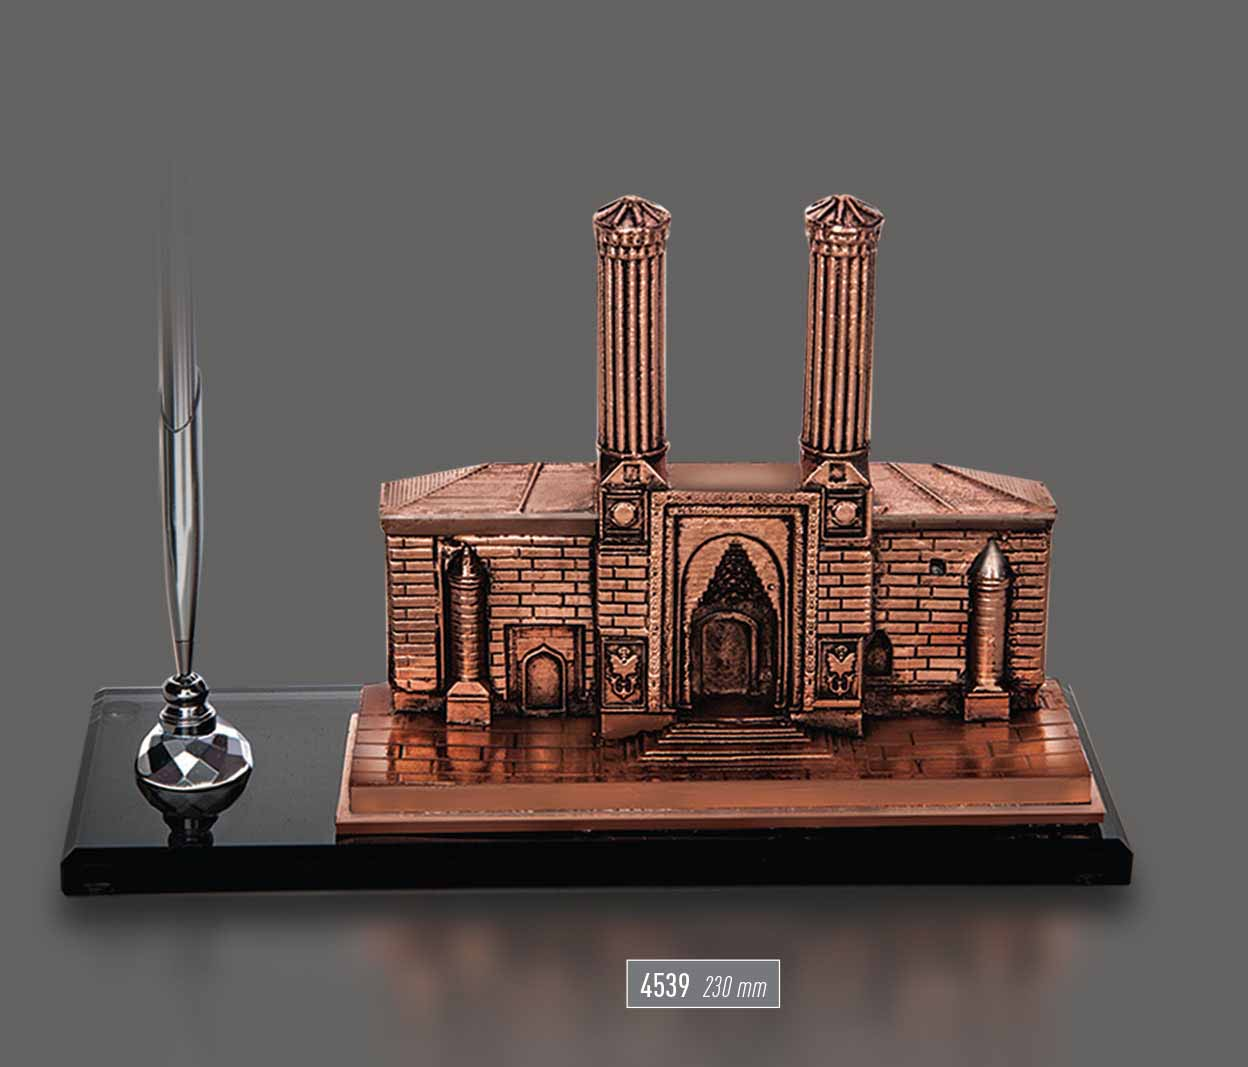 4539 - 3D Object